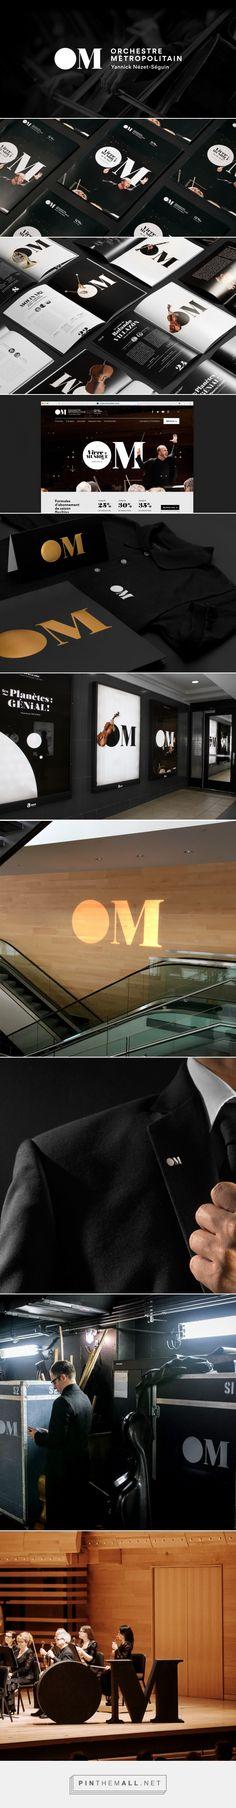 Orchestre Métropolitain brand identity - byHAUS - created via https://pinthemall.net